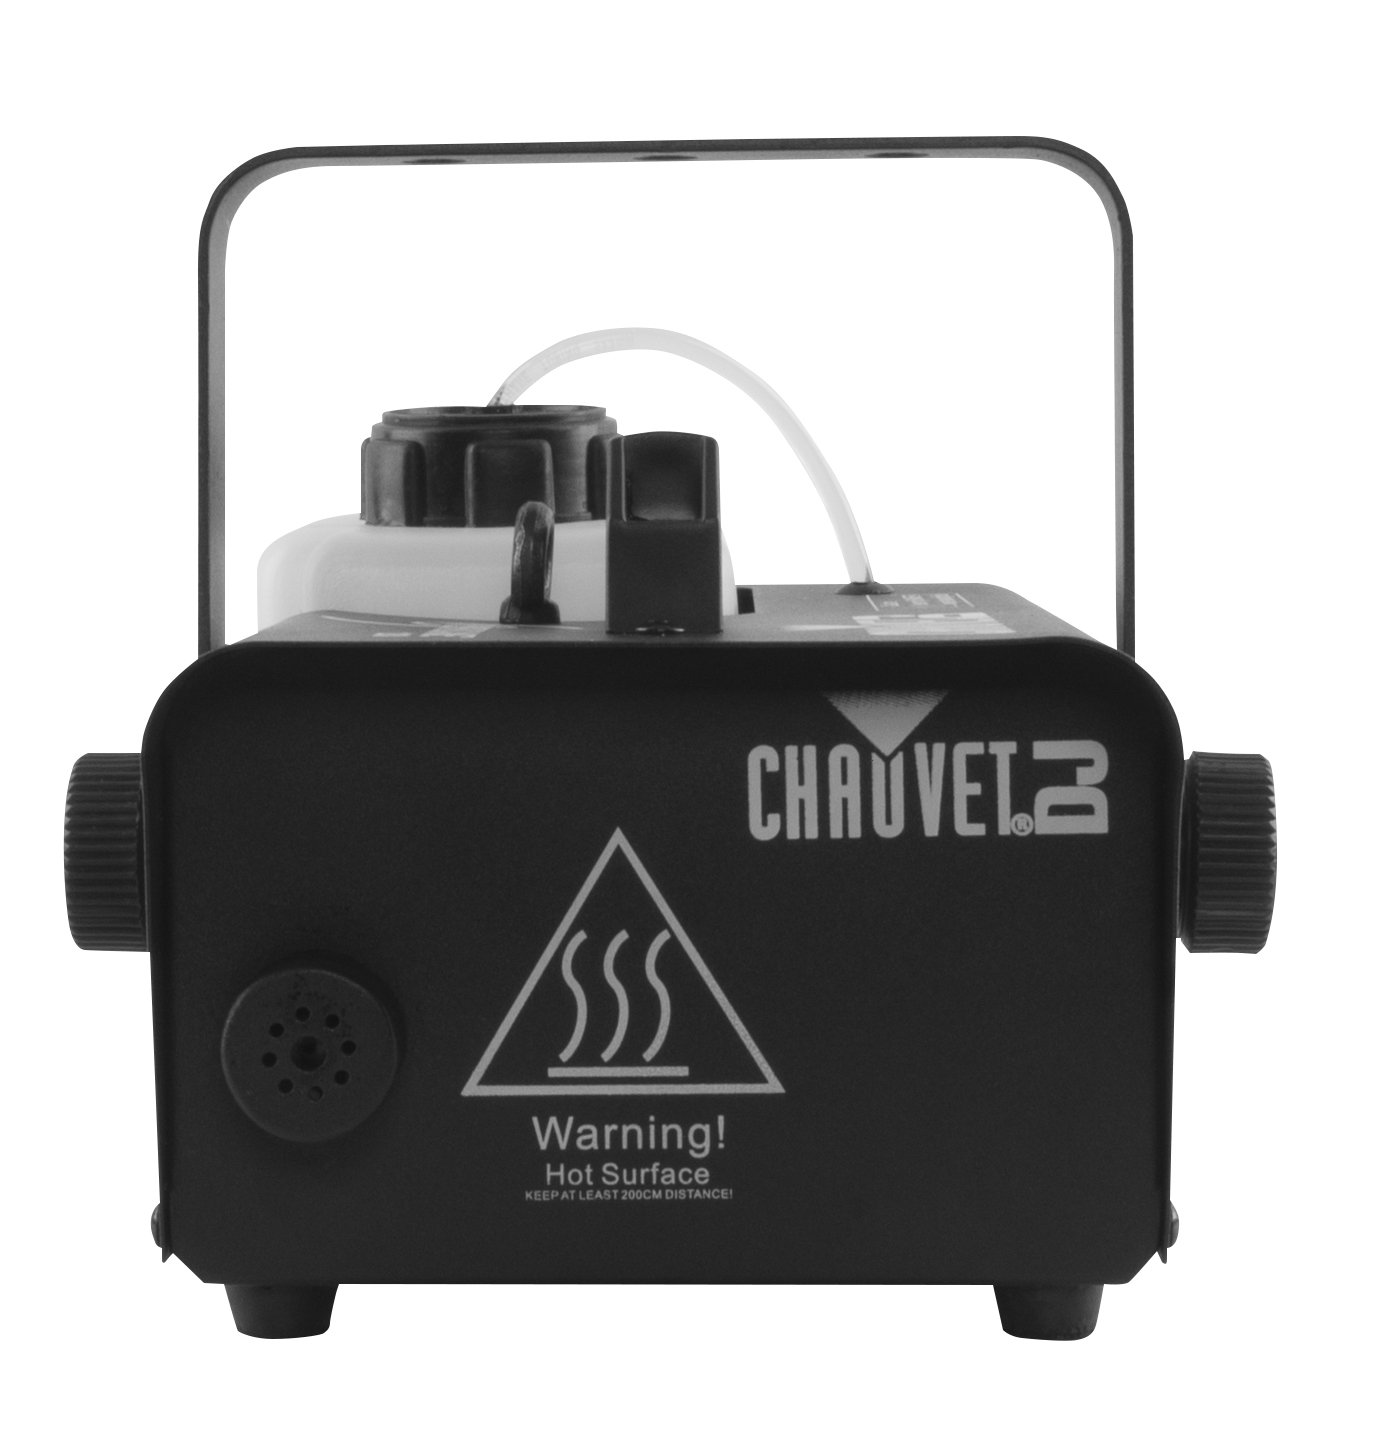 CHAUVET DJ H1200 Compact and Lightweight Fog Machine w/Timer Remote by CHAUVET DJ (Image #3)